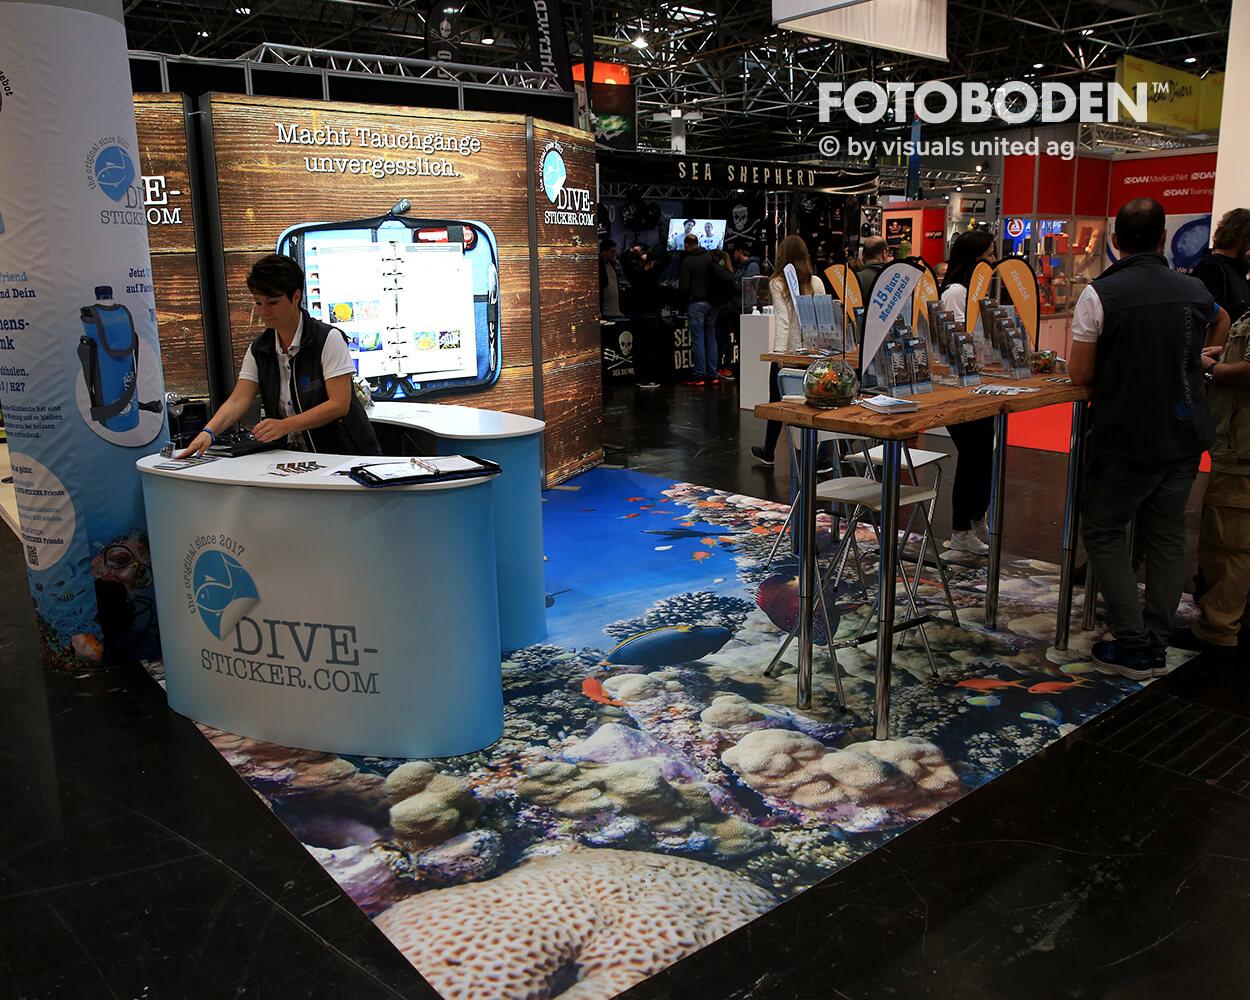 Boot2018 Fotoboden Messeboden Tradeshow Flooring Bodengestaltung Messe Bodendesign Messedesign Design Boden Messegestaltung 7